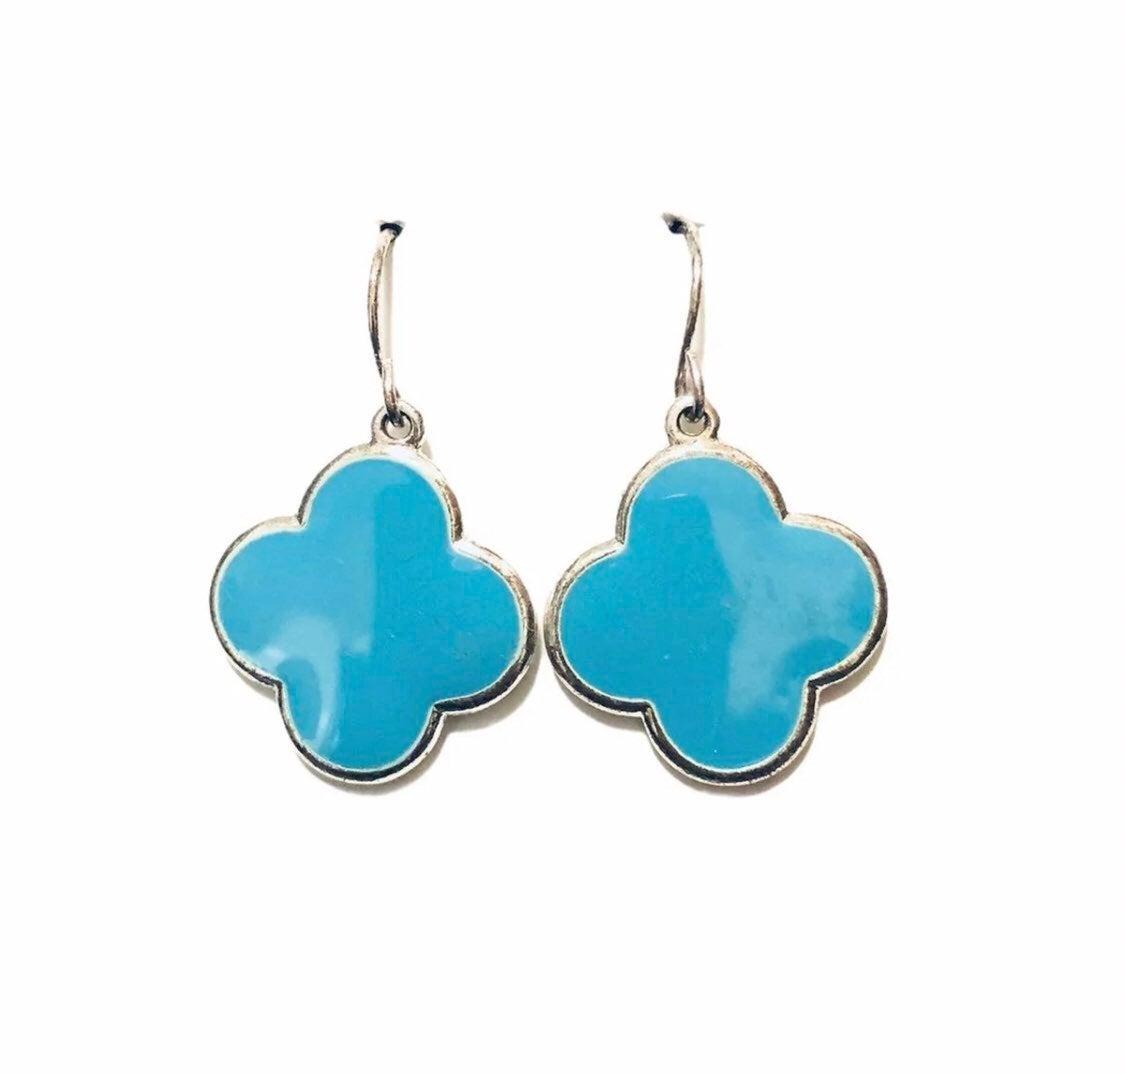 Blue Earrings four leaf clover good luck